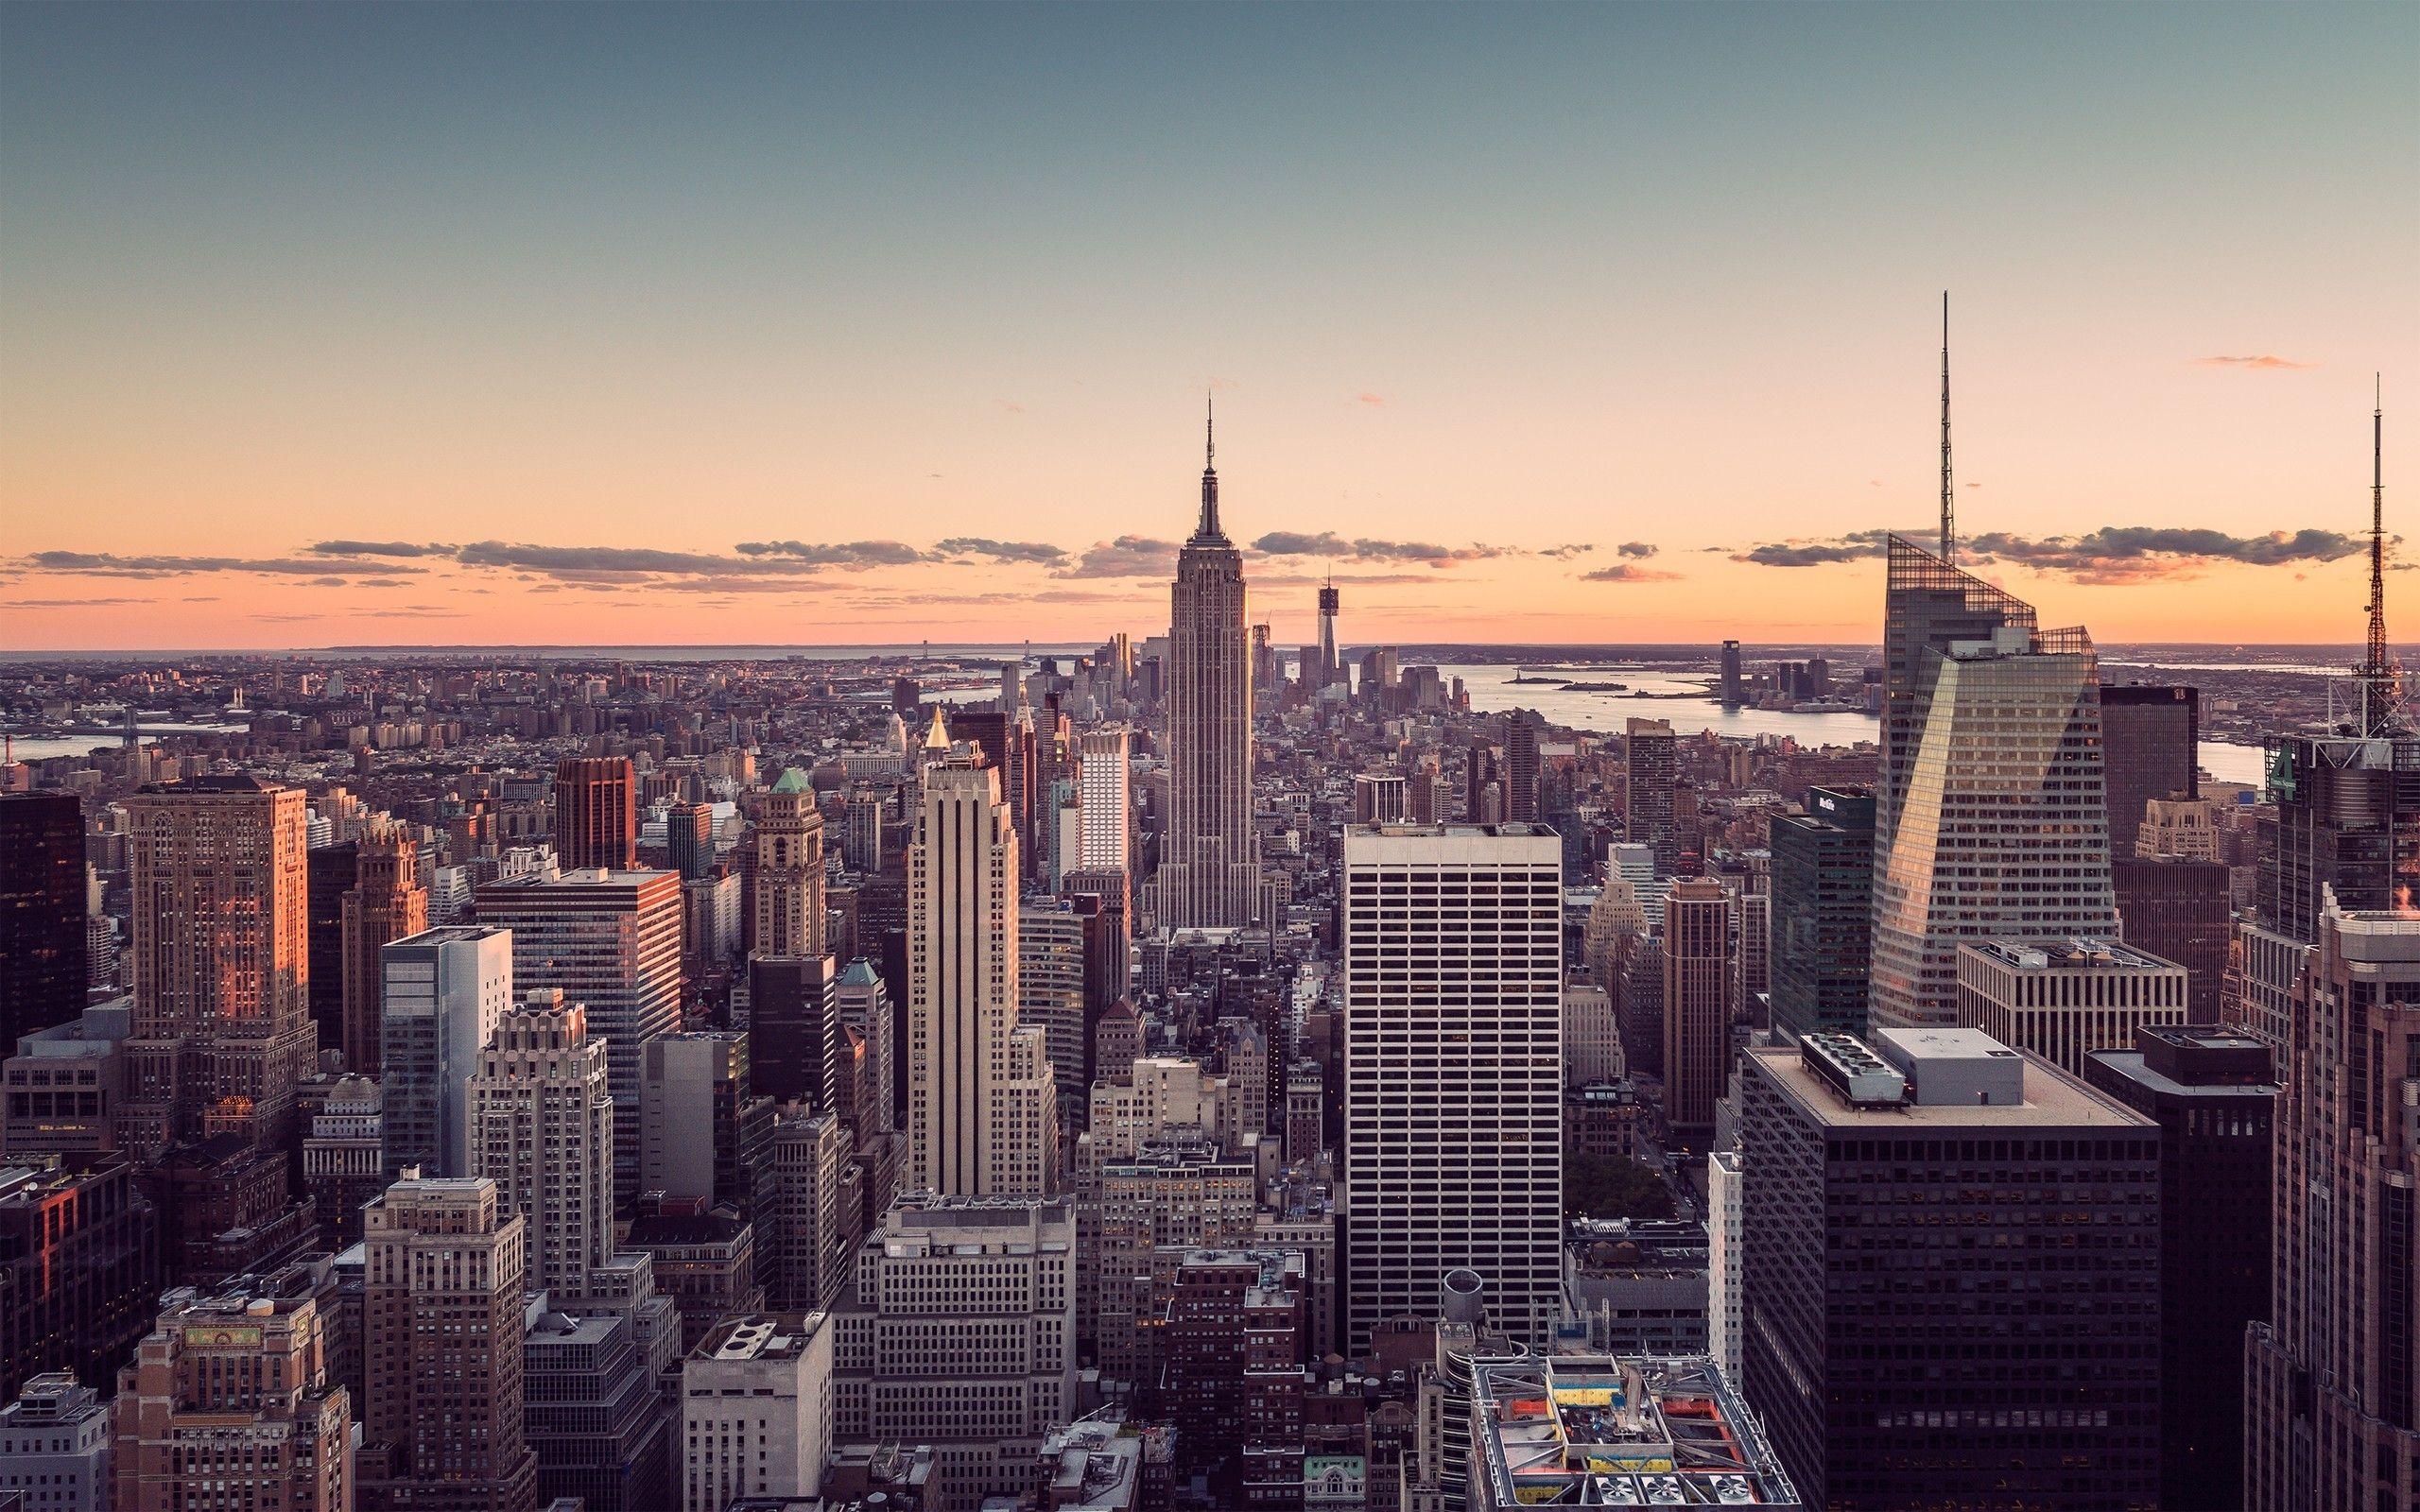 Sunset City New York Wallpaper Free Background Desktop Images